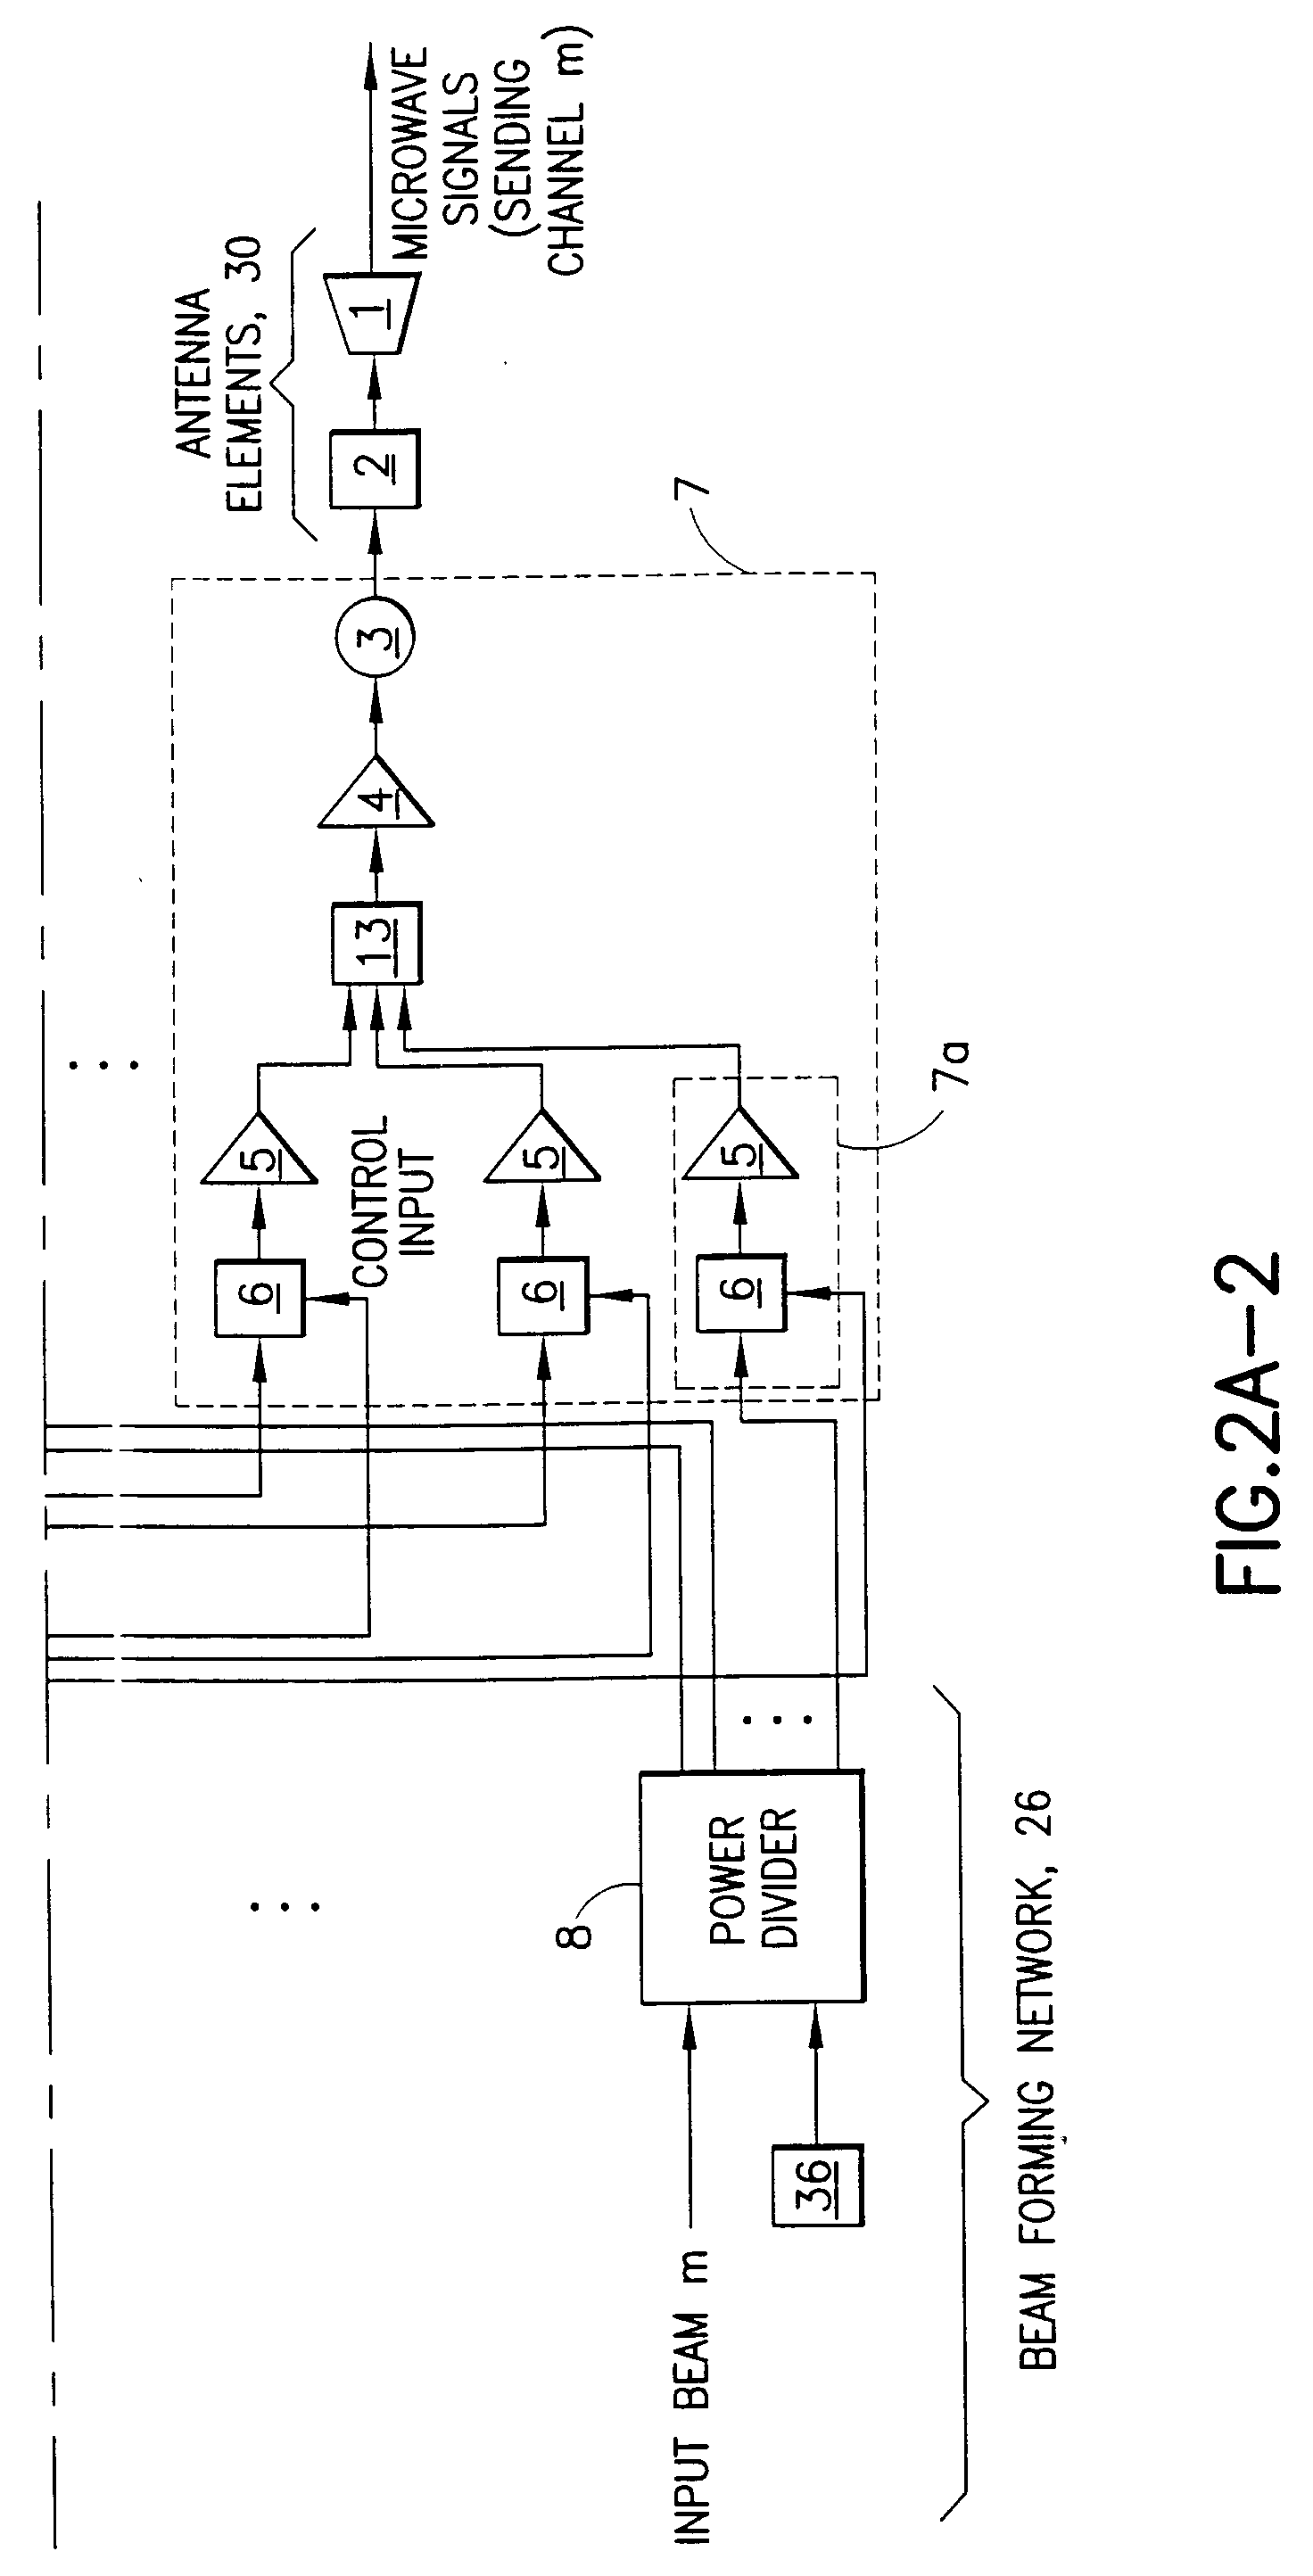 patent ep0939452a2